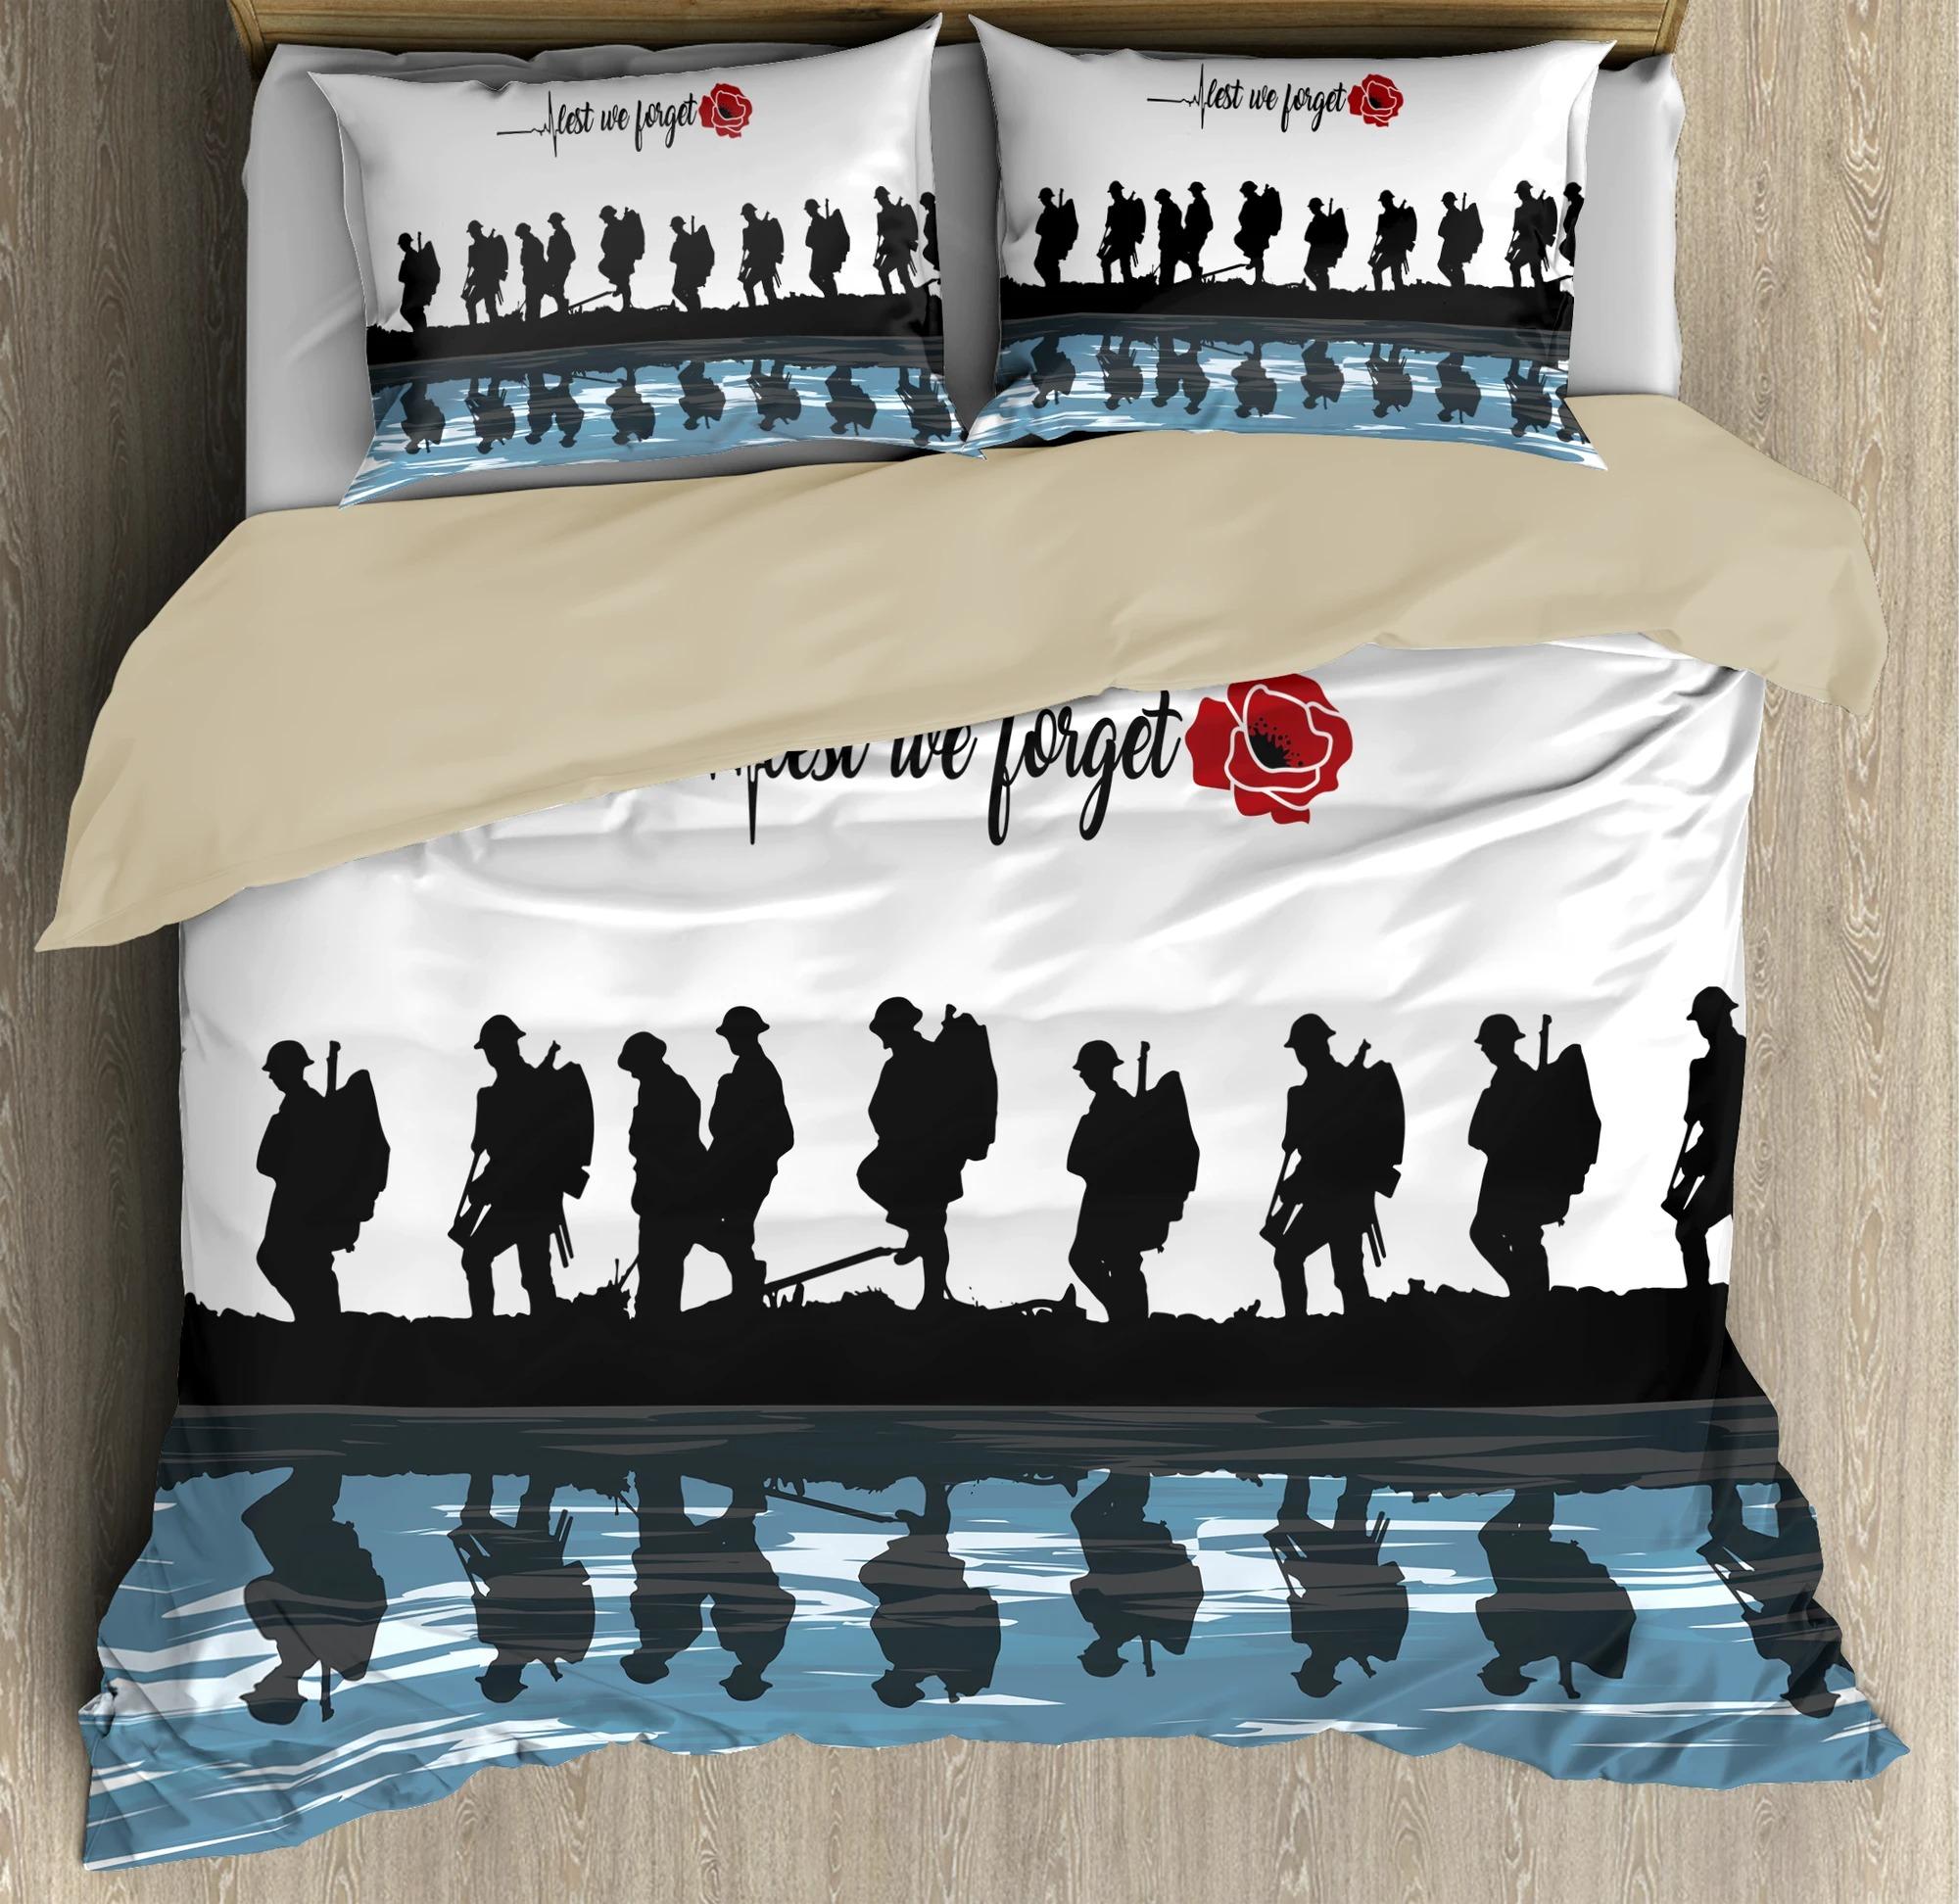 UK Veteran Let we forget honor the fallen bedding set 3